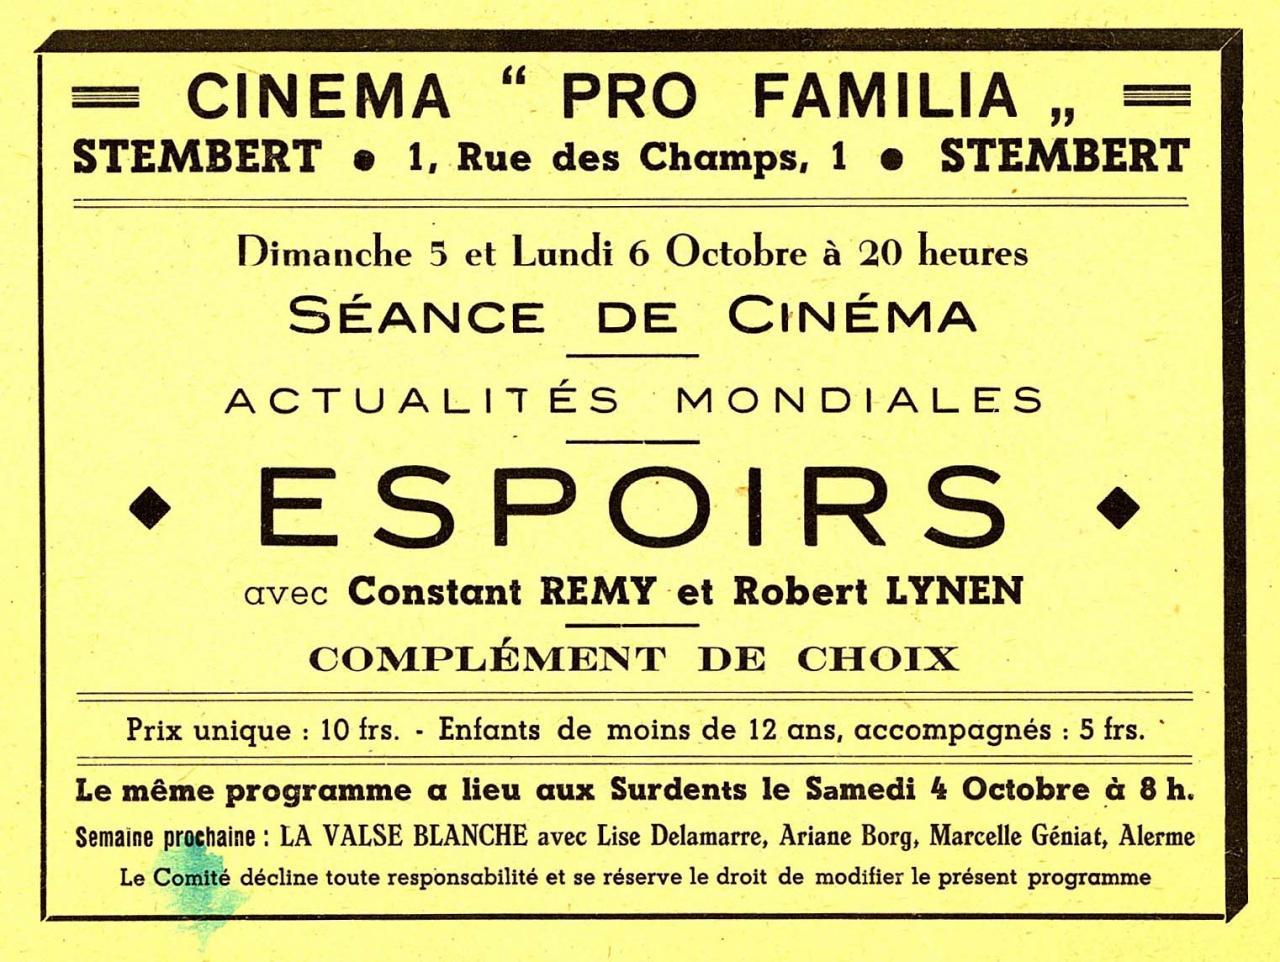 cinema-pro-familia-03.jpg